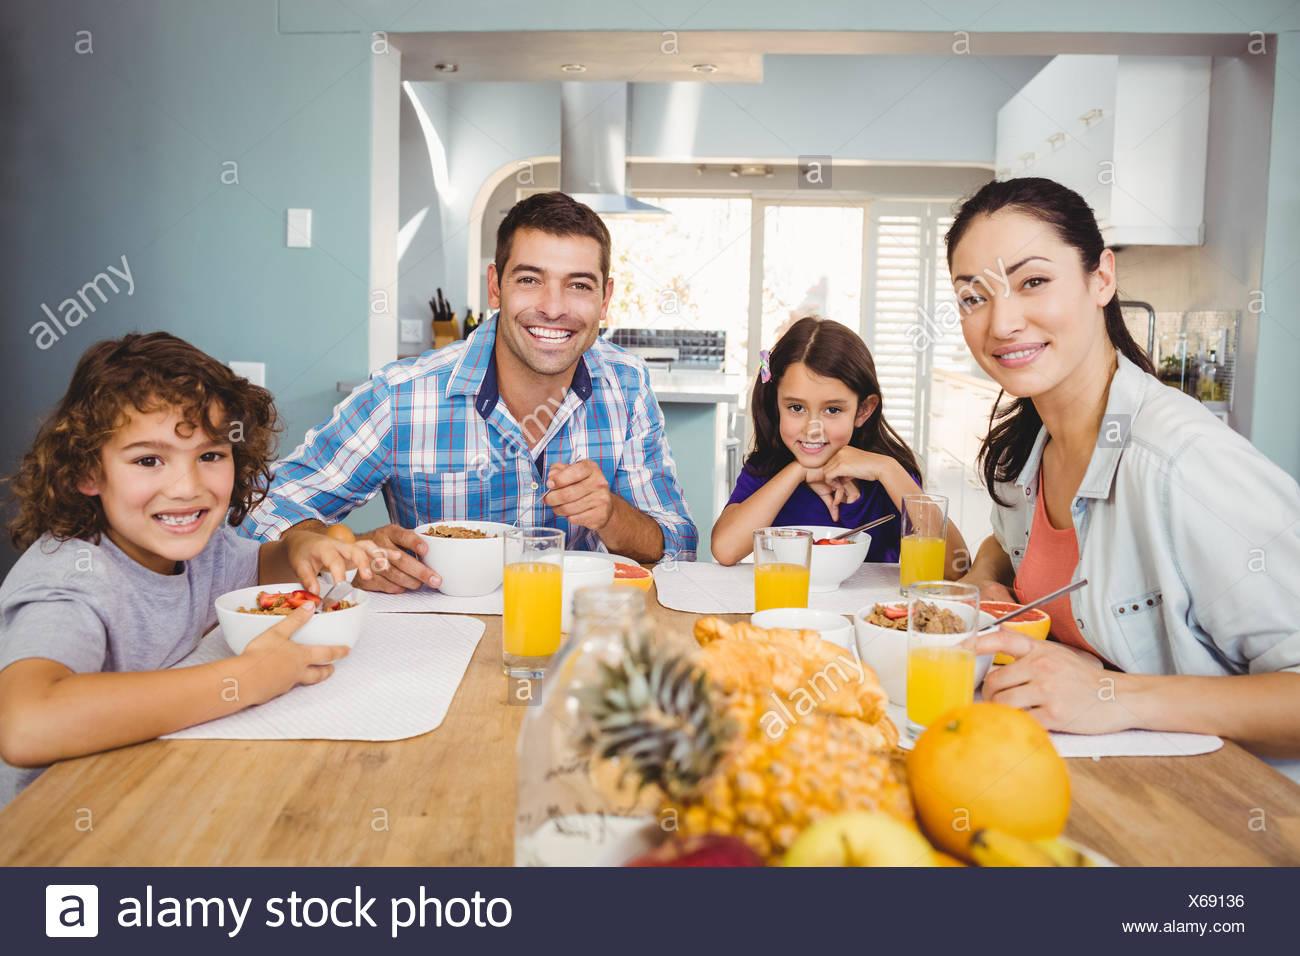 Portrait of happy family having breakfast - Stock Image